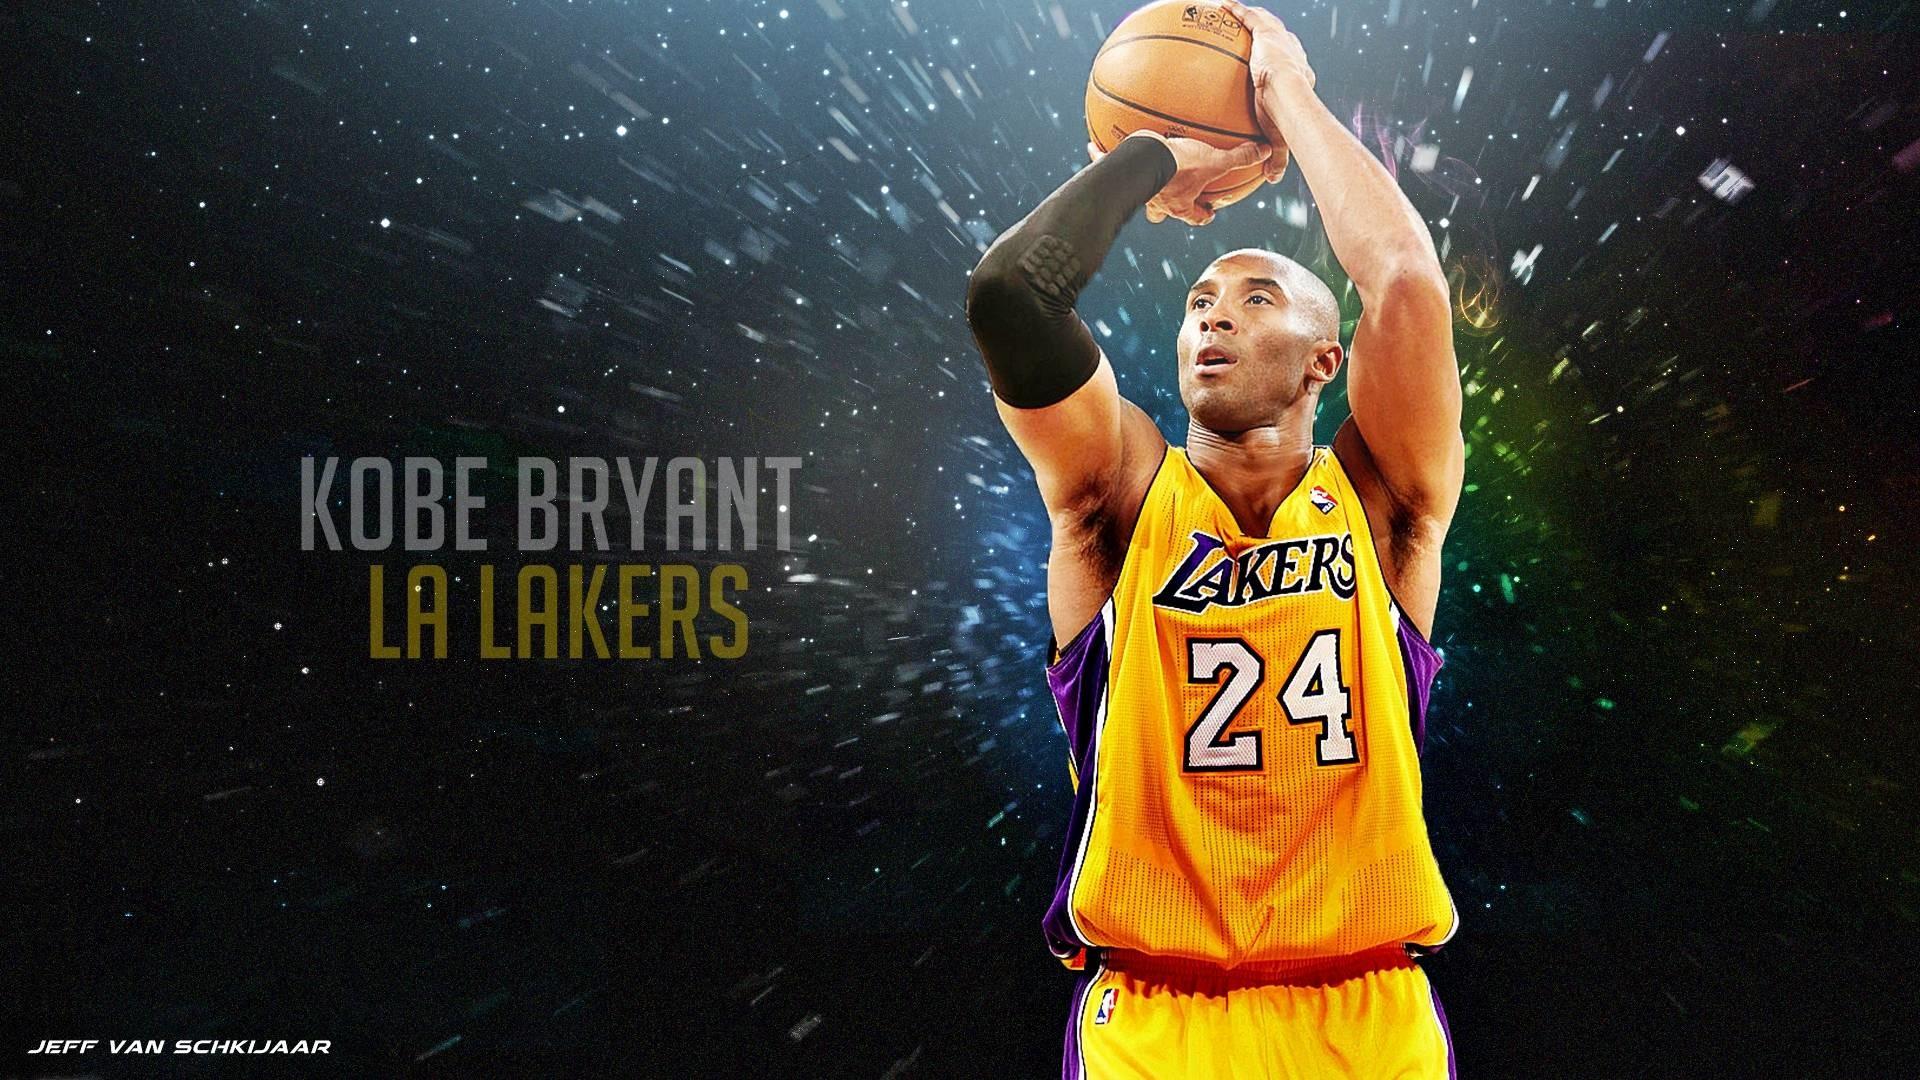 Kobe Bryant LA Lakers Wallpaper HD #3048 | Hdwidescreens.